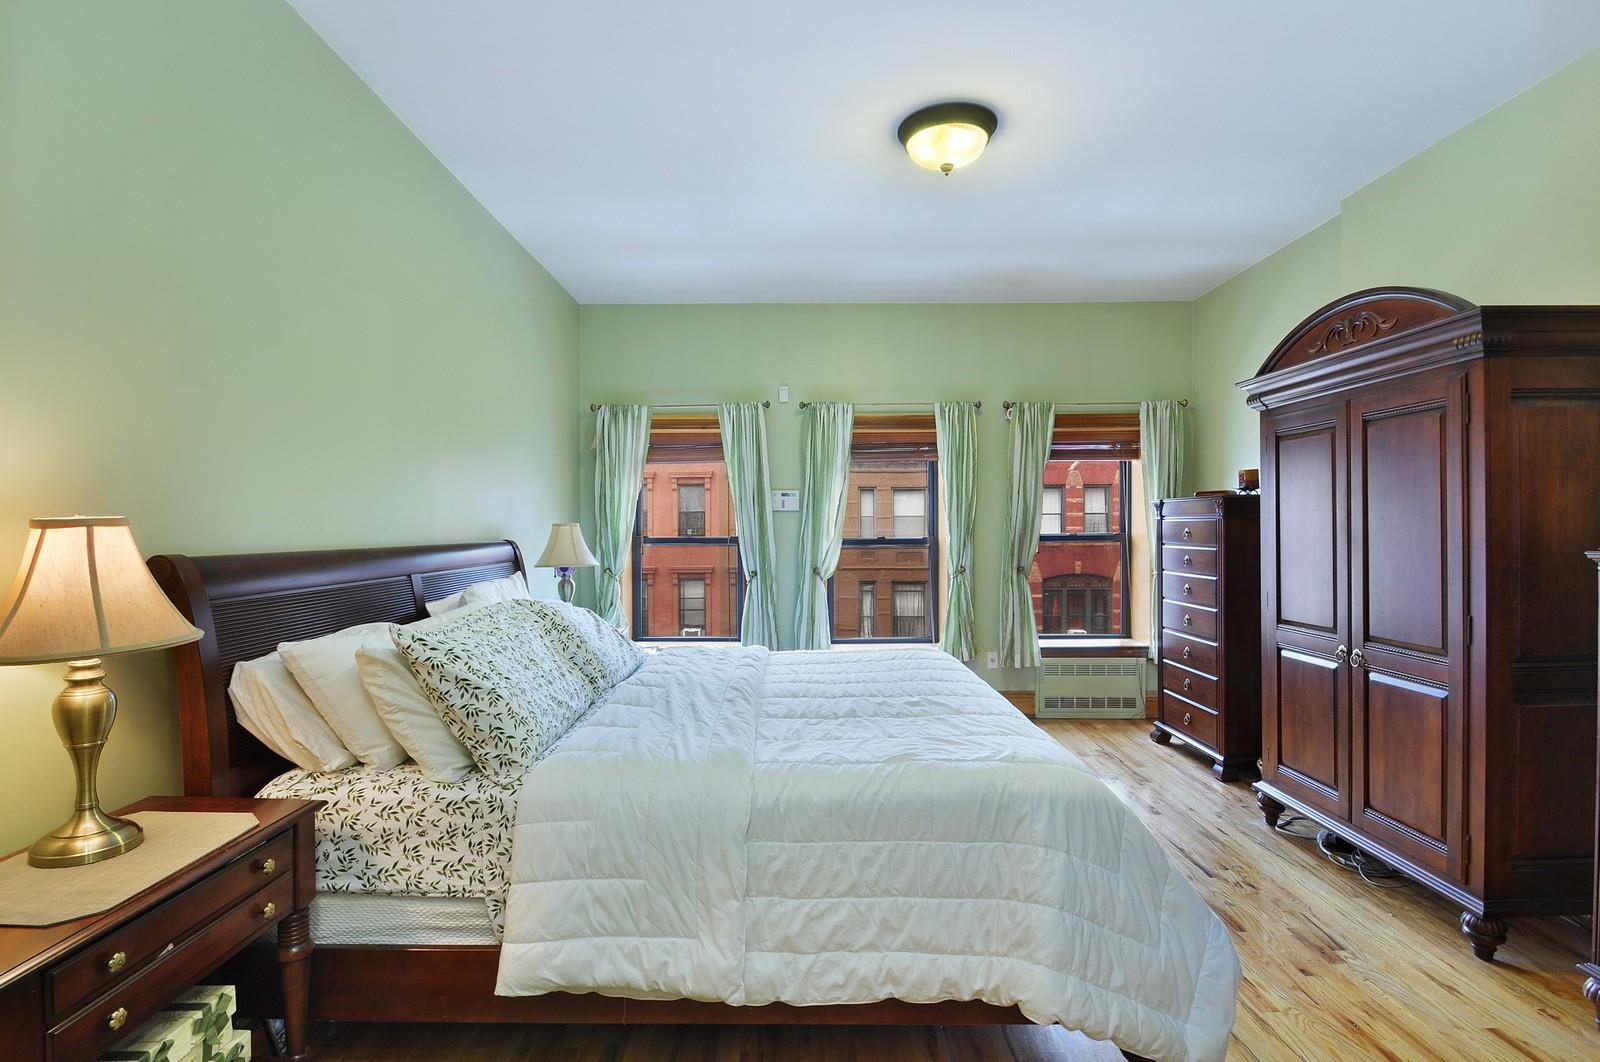 Corcoran, 208 West 122nd Street, Harlem Real Estate, Manhattan For ...